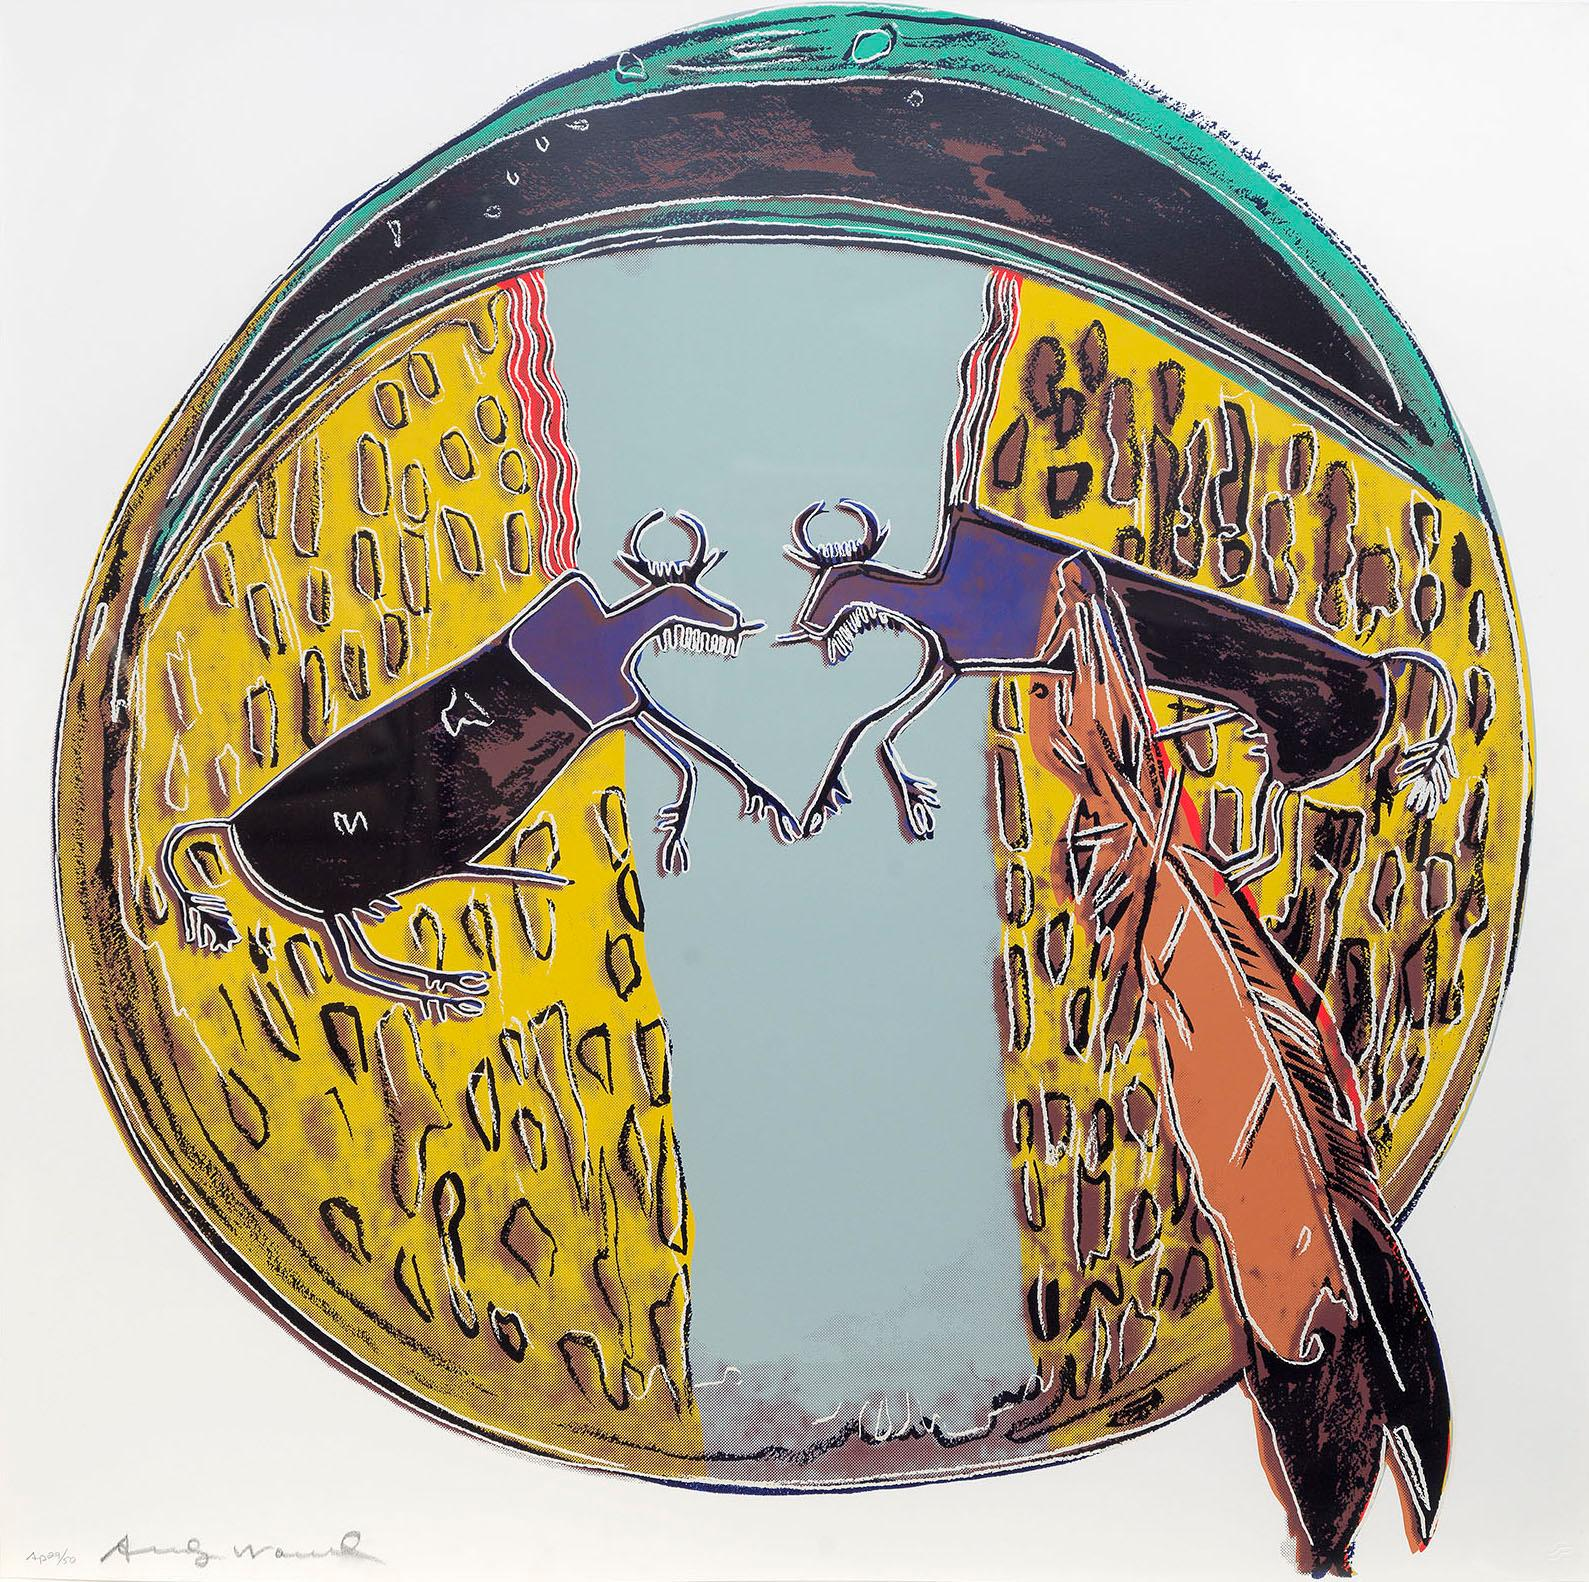 Plains Indian Shield - Andy Warhol, Pop Art, Prints, Screenprints, Contemporary